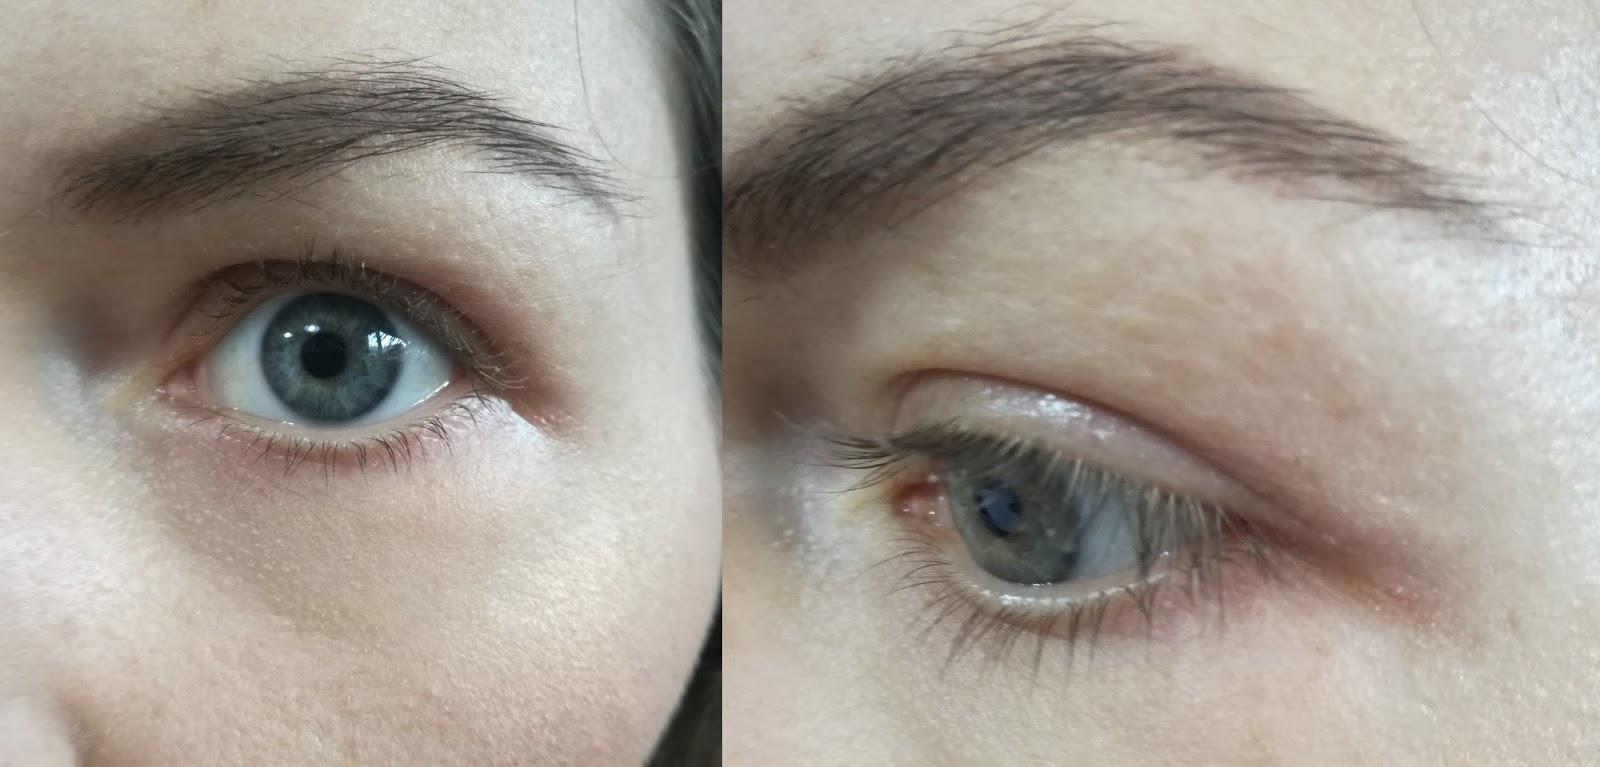 oriflame-colourbox-fat-lash-mascara-review-naked-eye